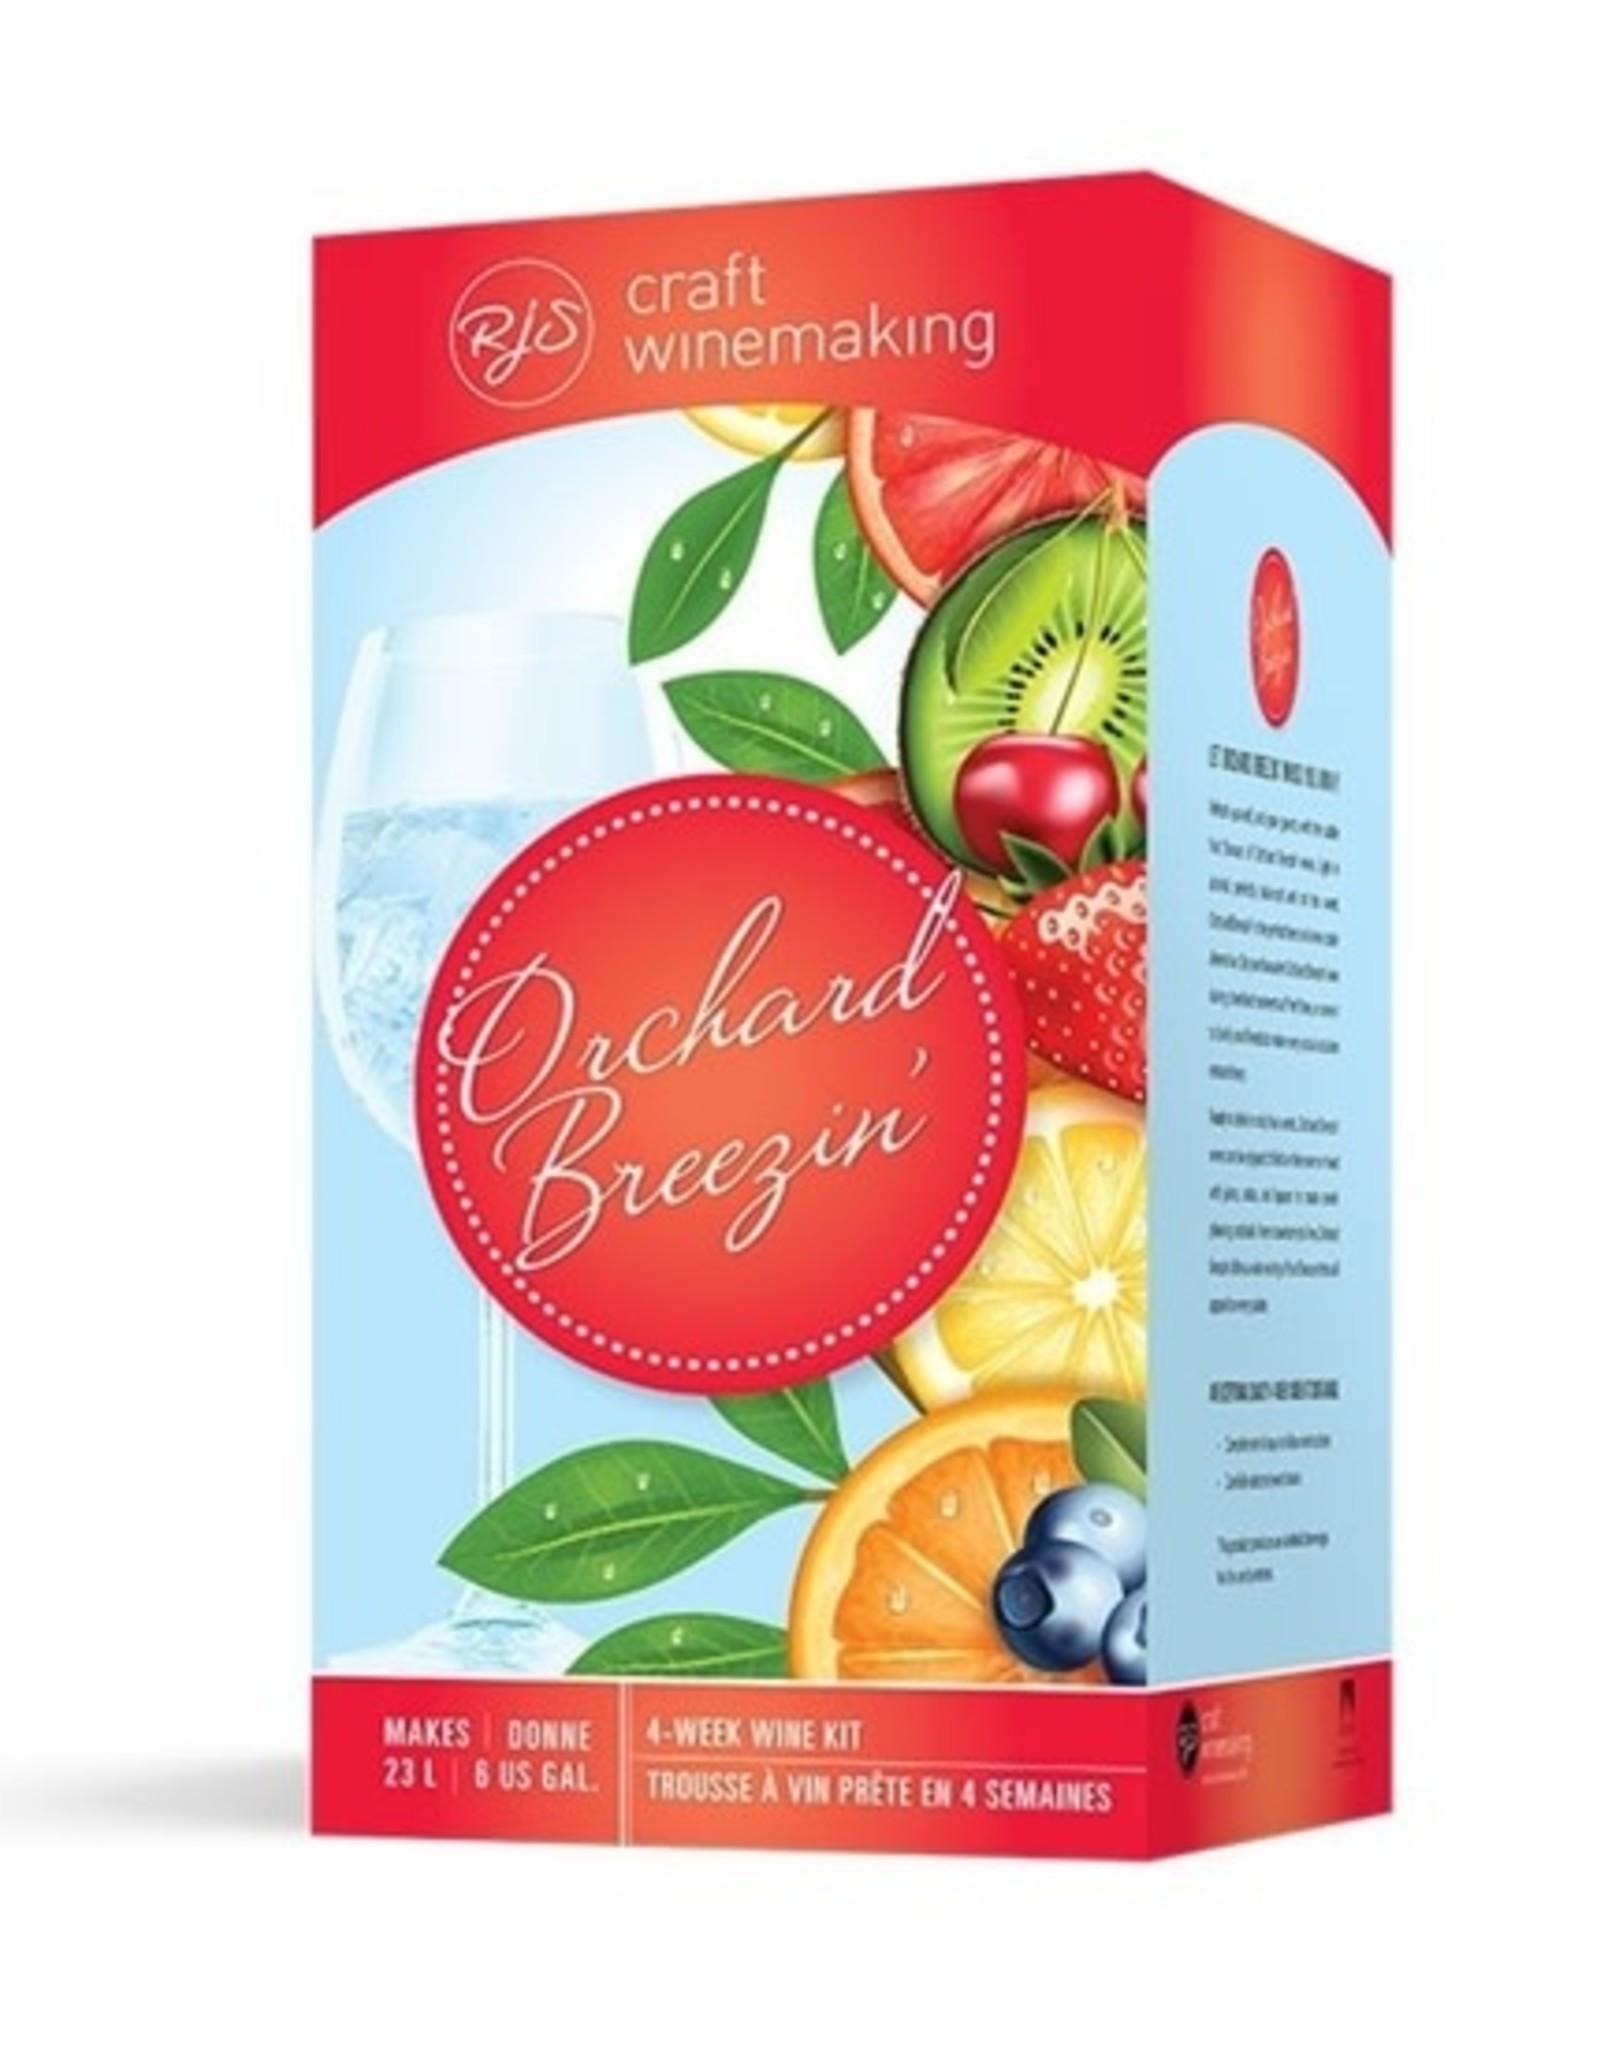 Orchard Breezin' PEACH PERFECTION